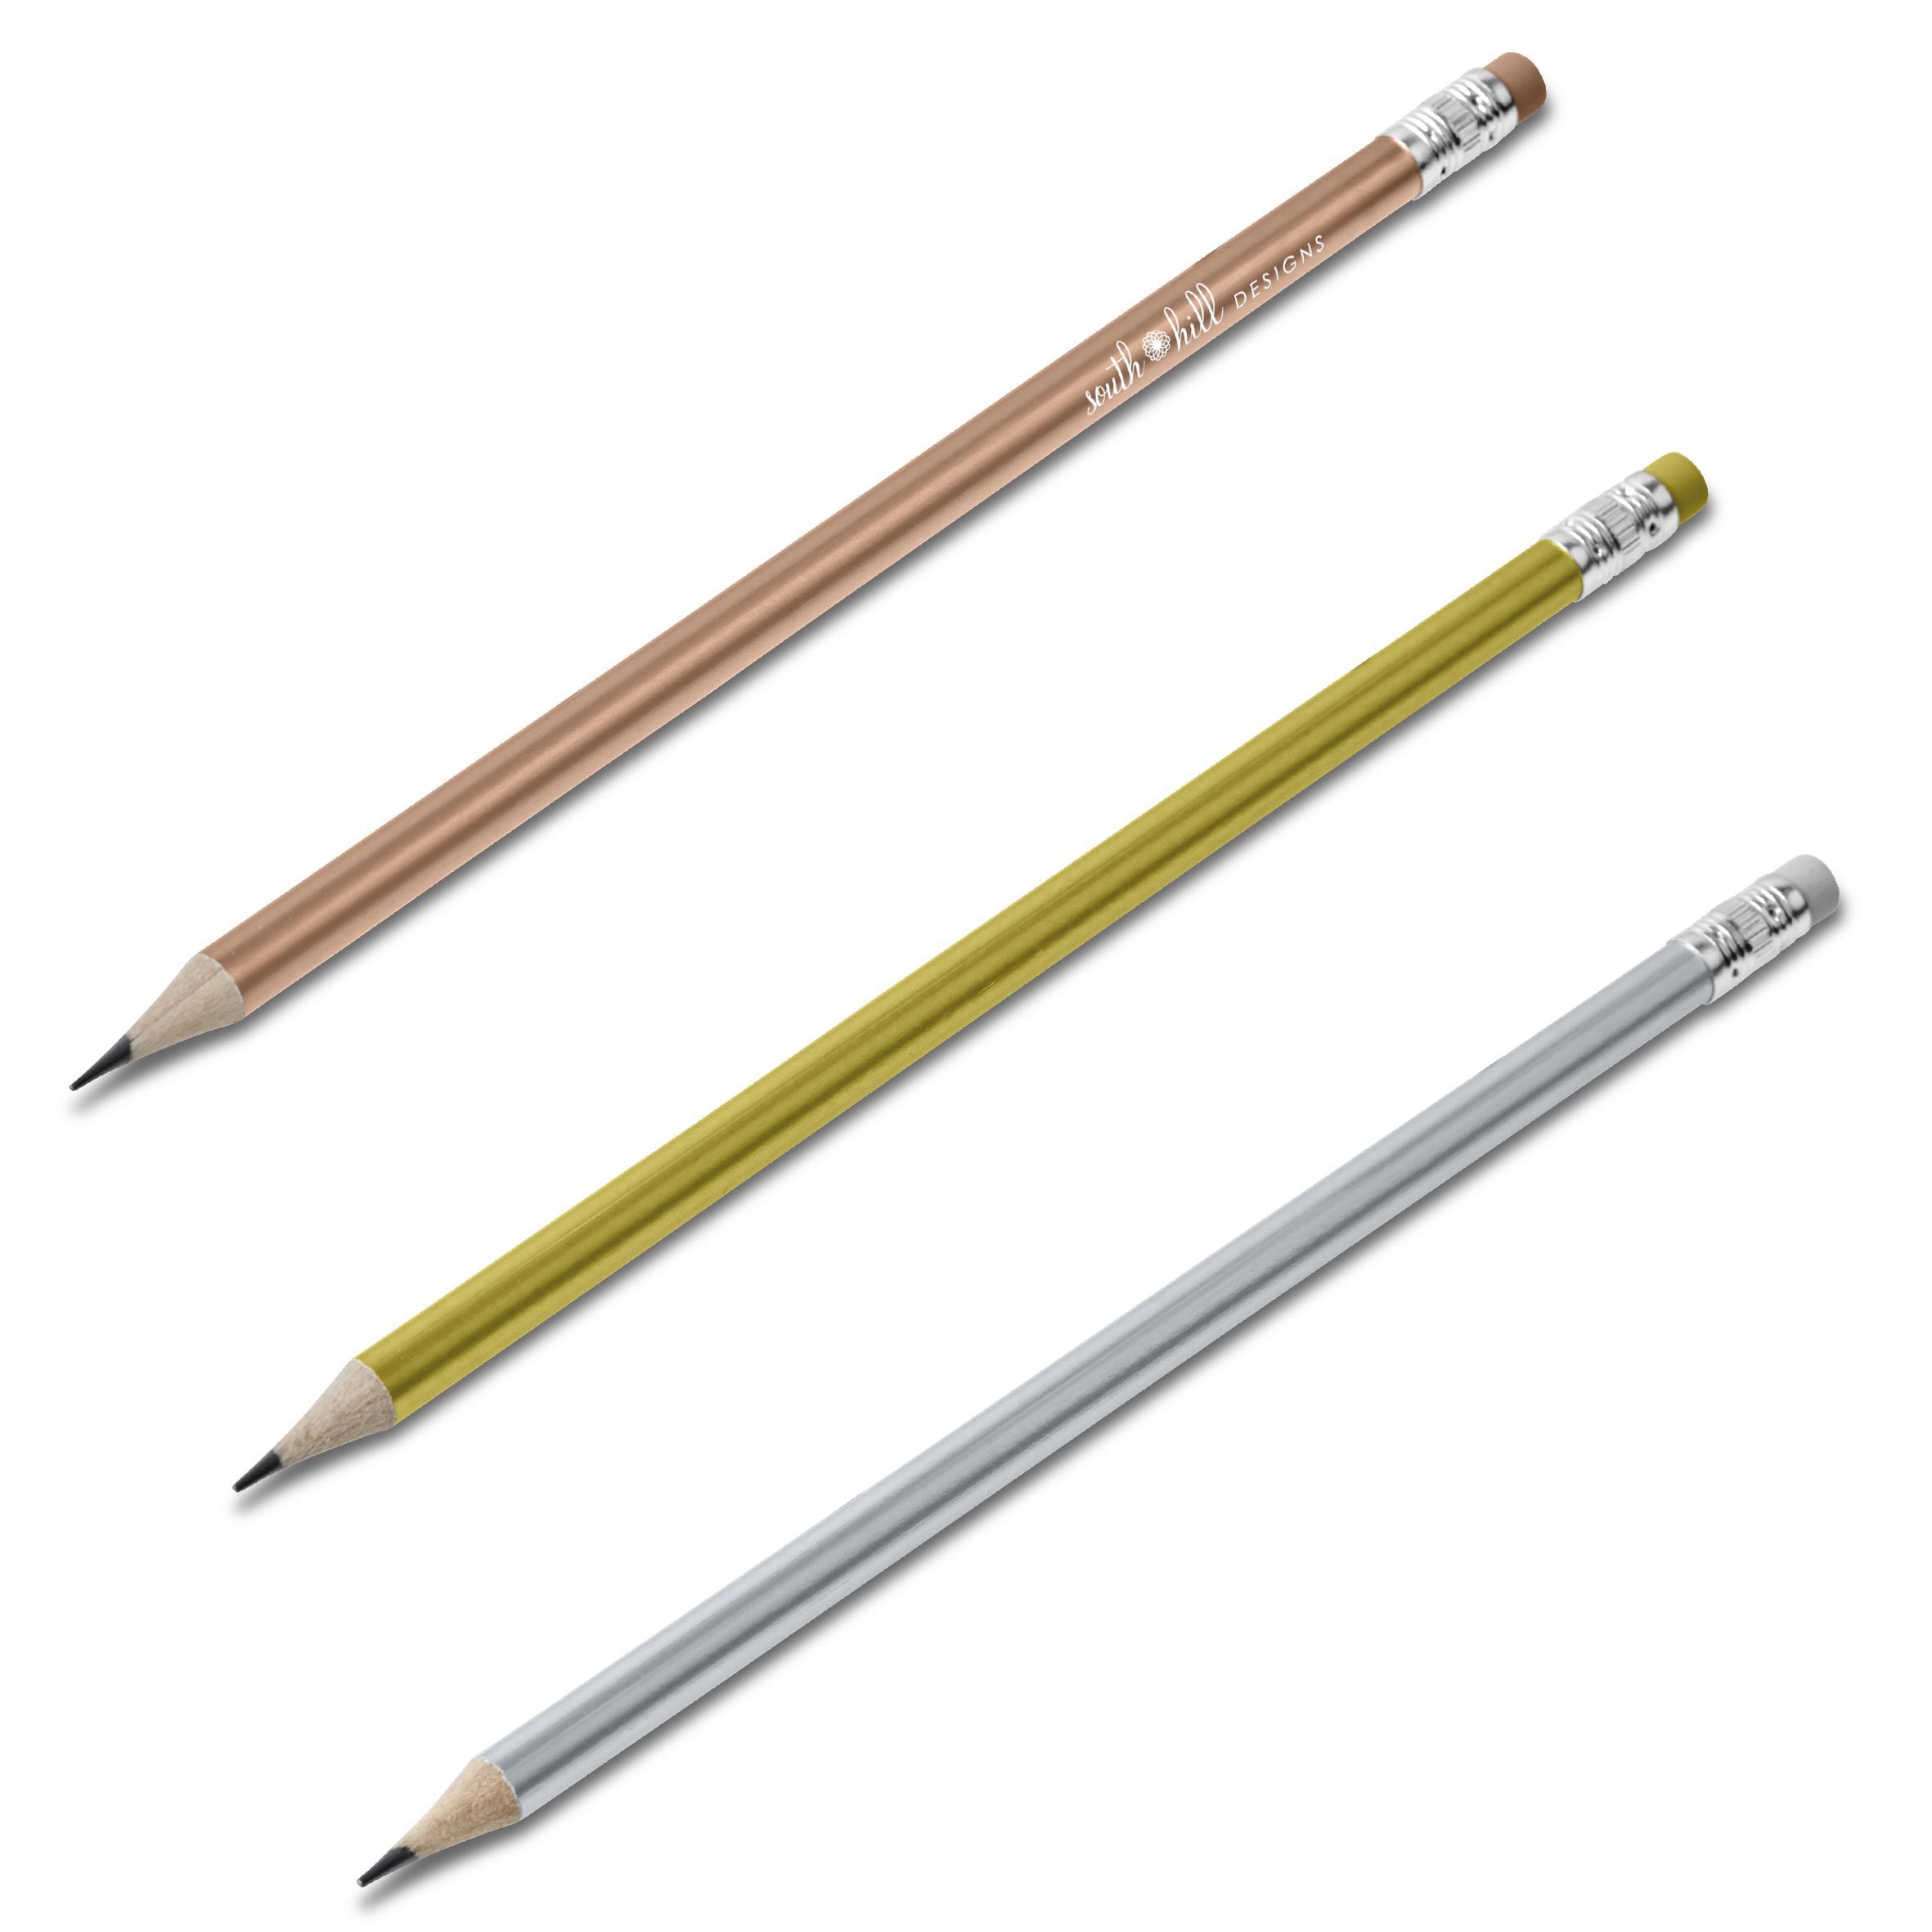 Razzmatazz Pencil